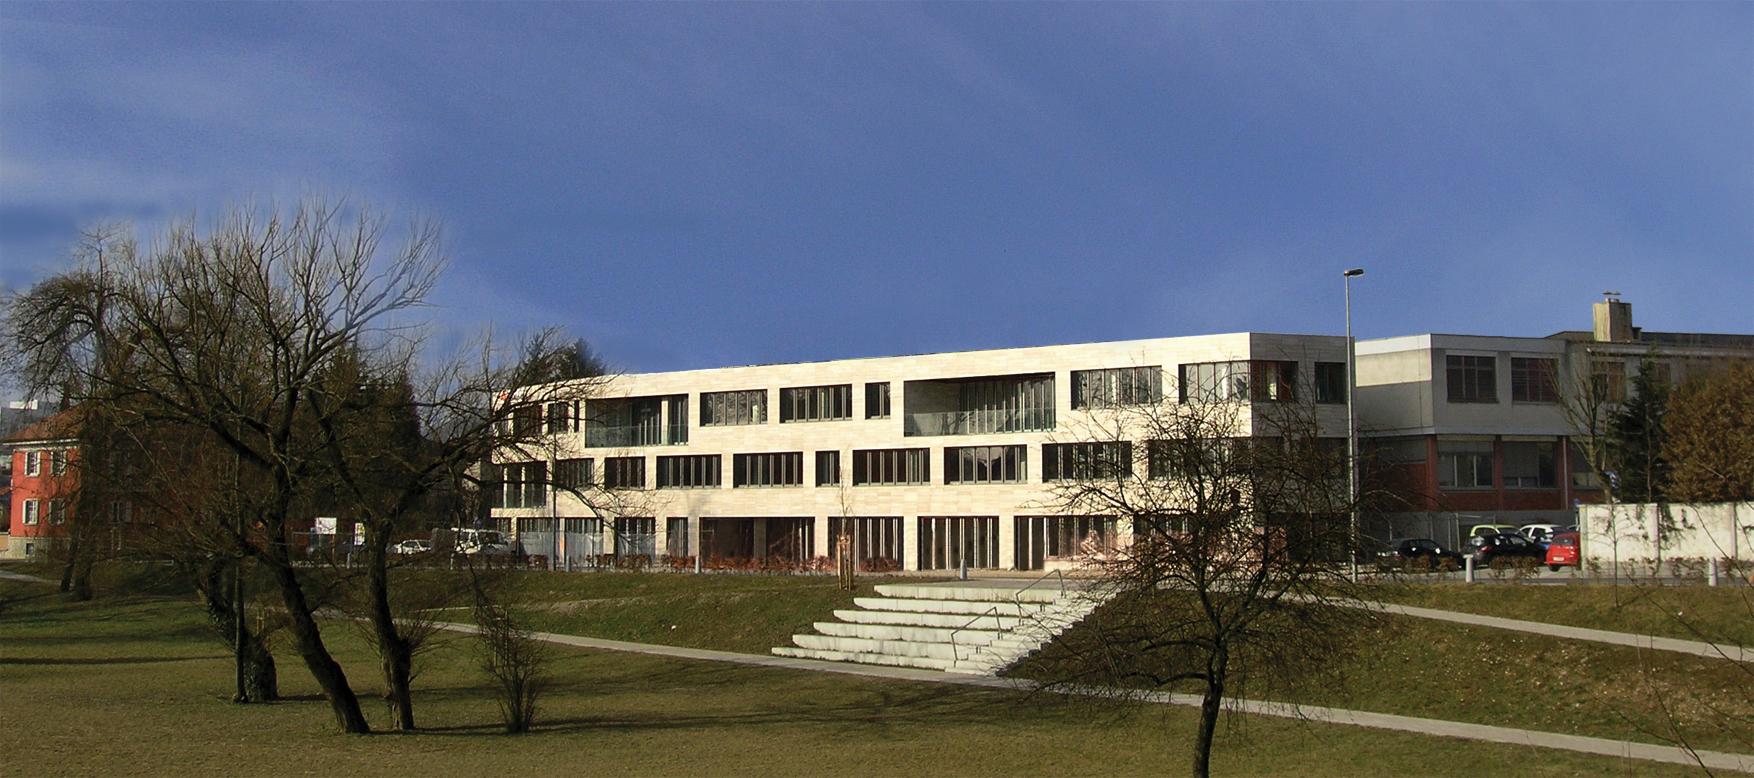 Rapir building